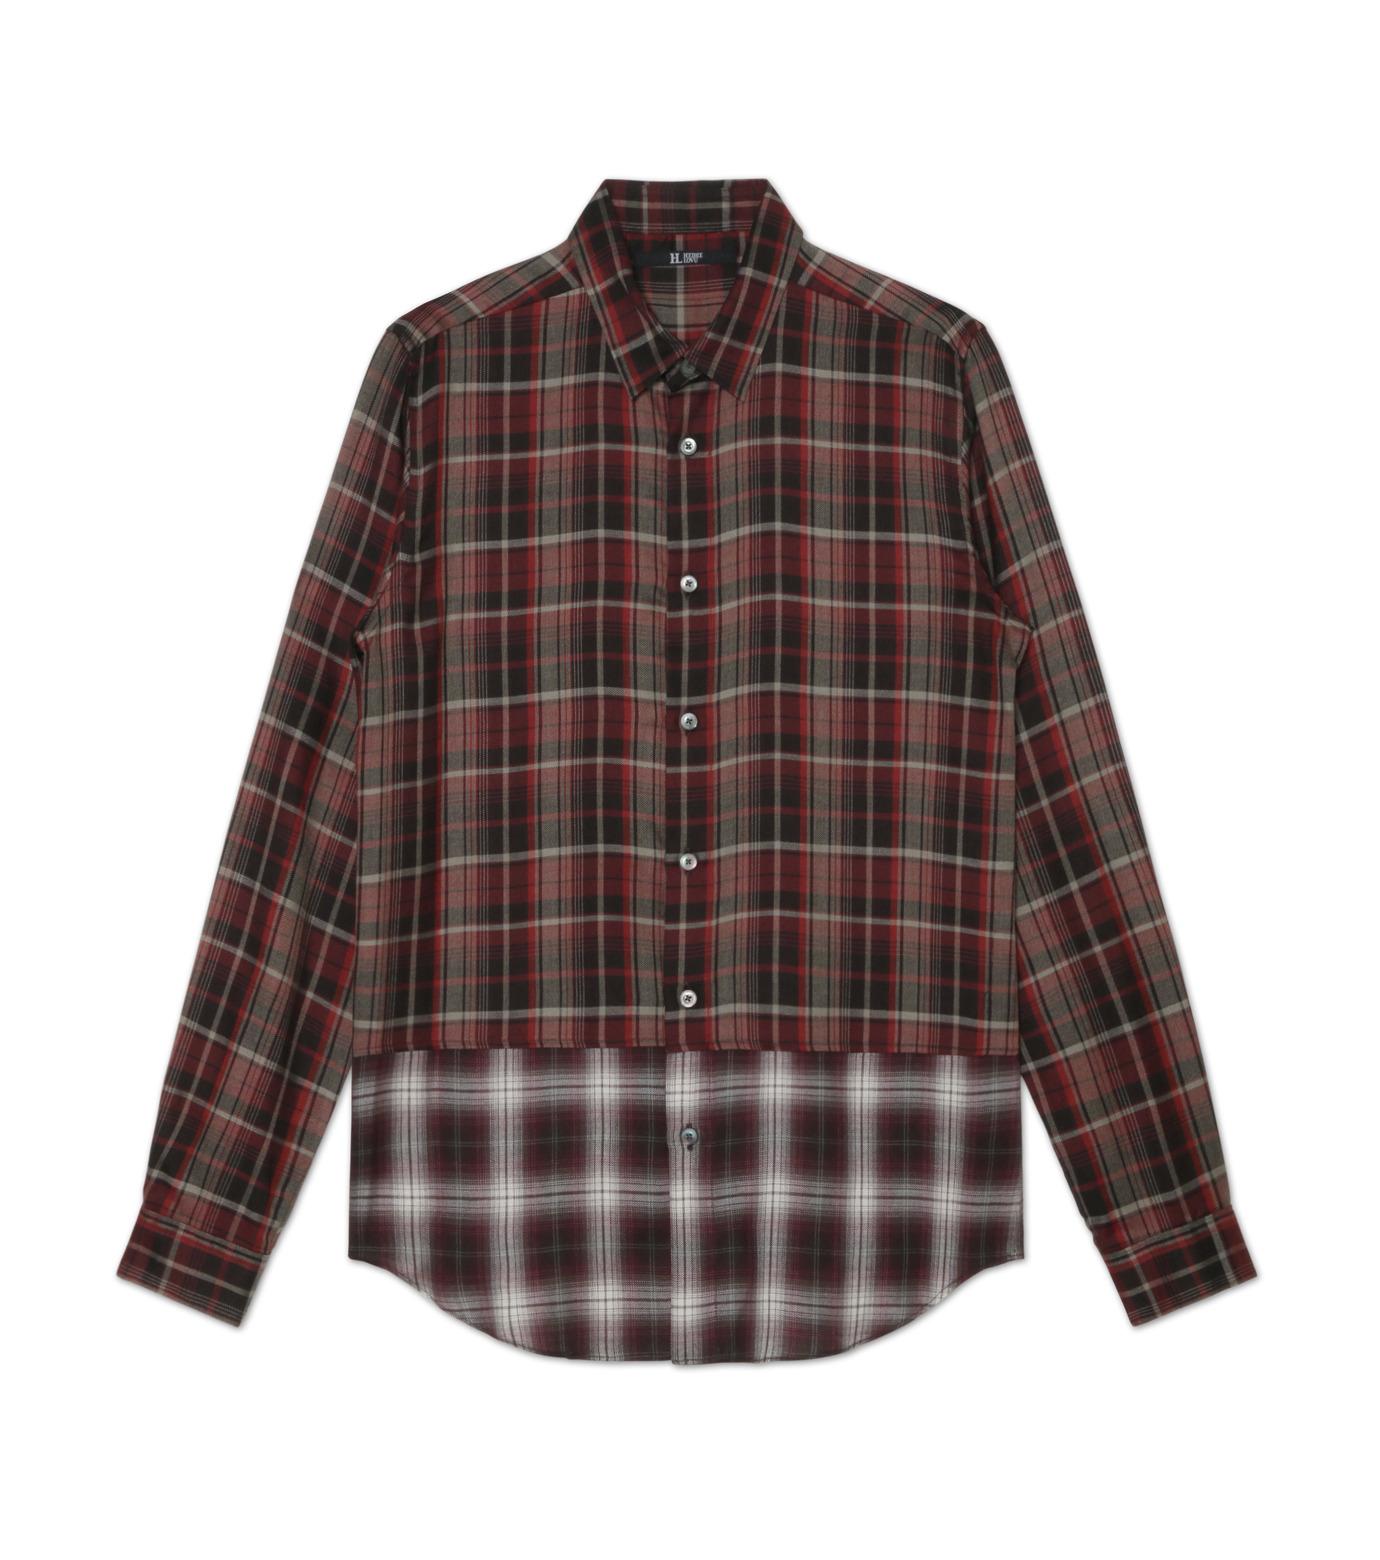 HL HEDDIE LOVU(エイチエル・エディールーヴ)のLAYERED CHECK SHIRT-RED(シャツ/shirt)-18A93001-62 拡大詳細画像4